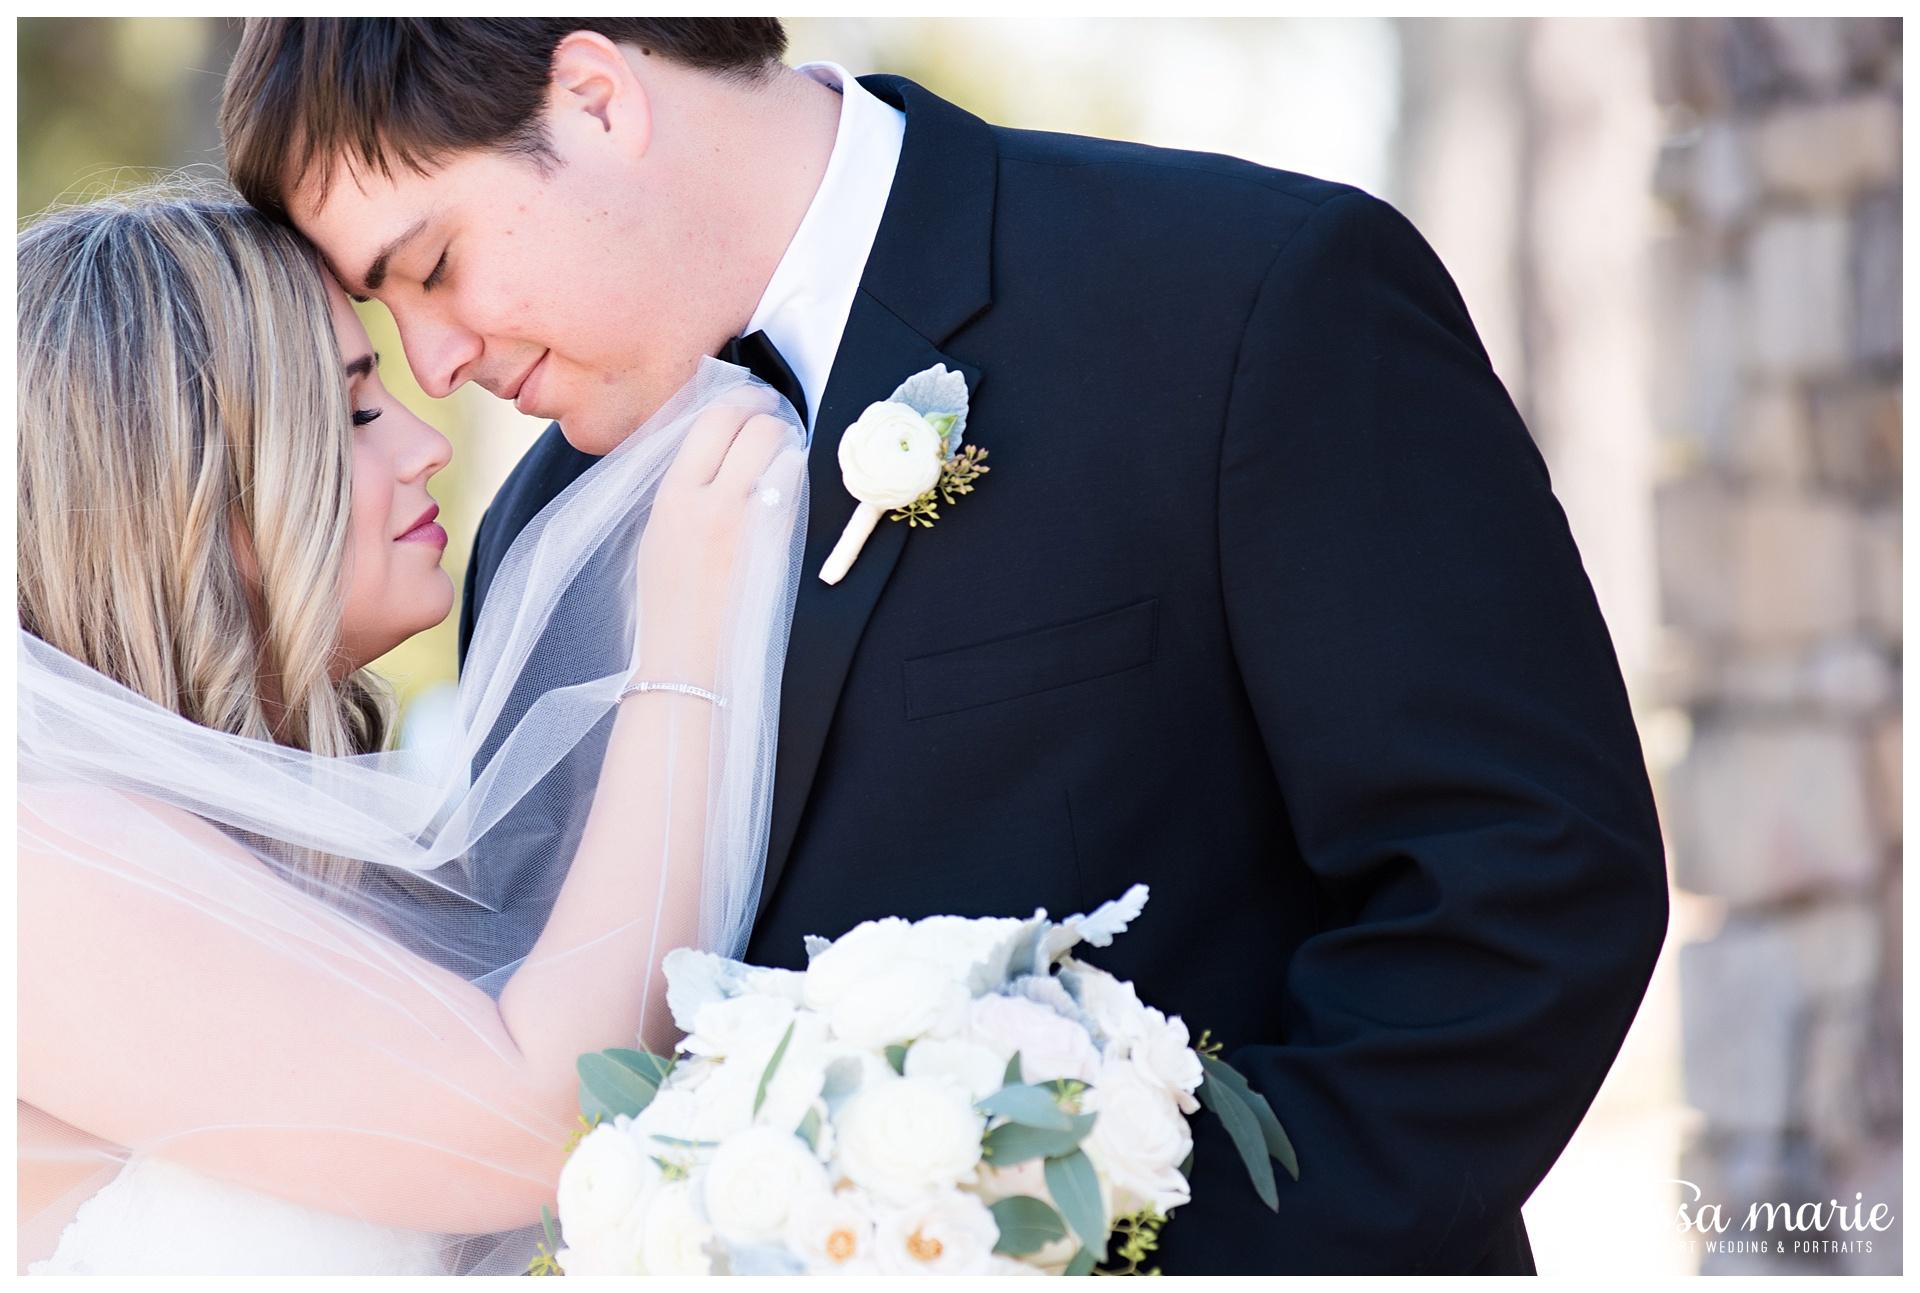 tessa_marie_weddings_legacy_story_focused_wedding_pictures_atlanta_wedding_photographer_0087